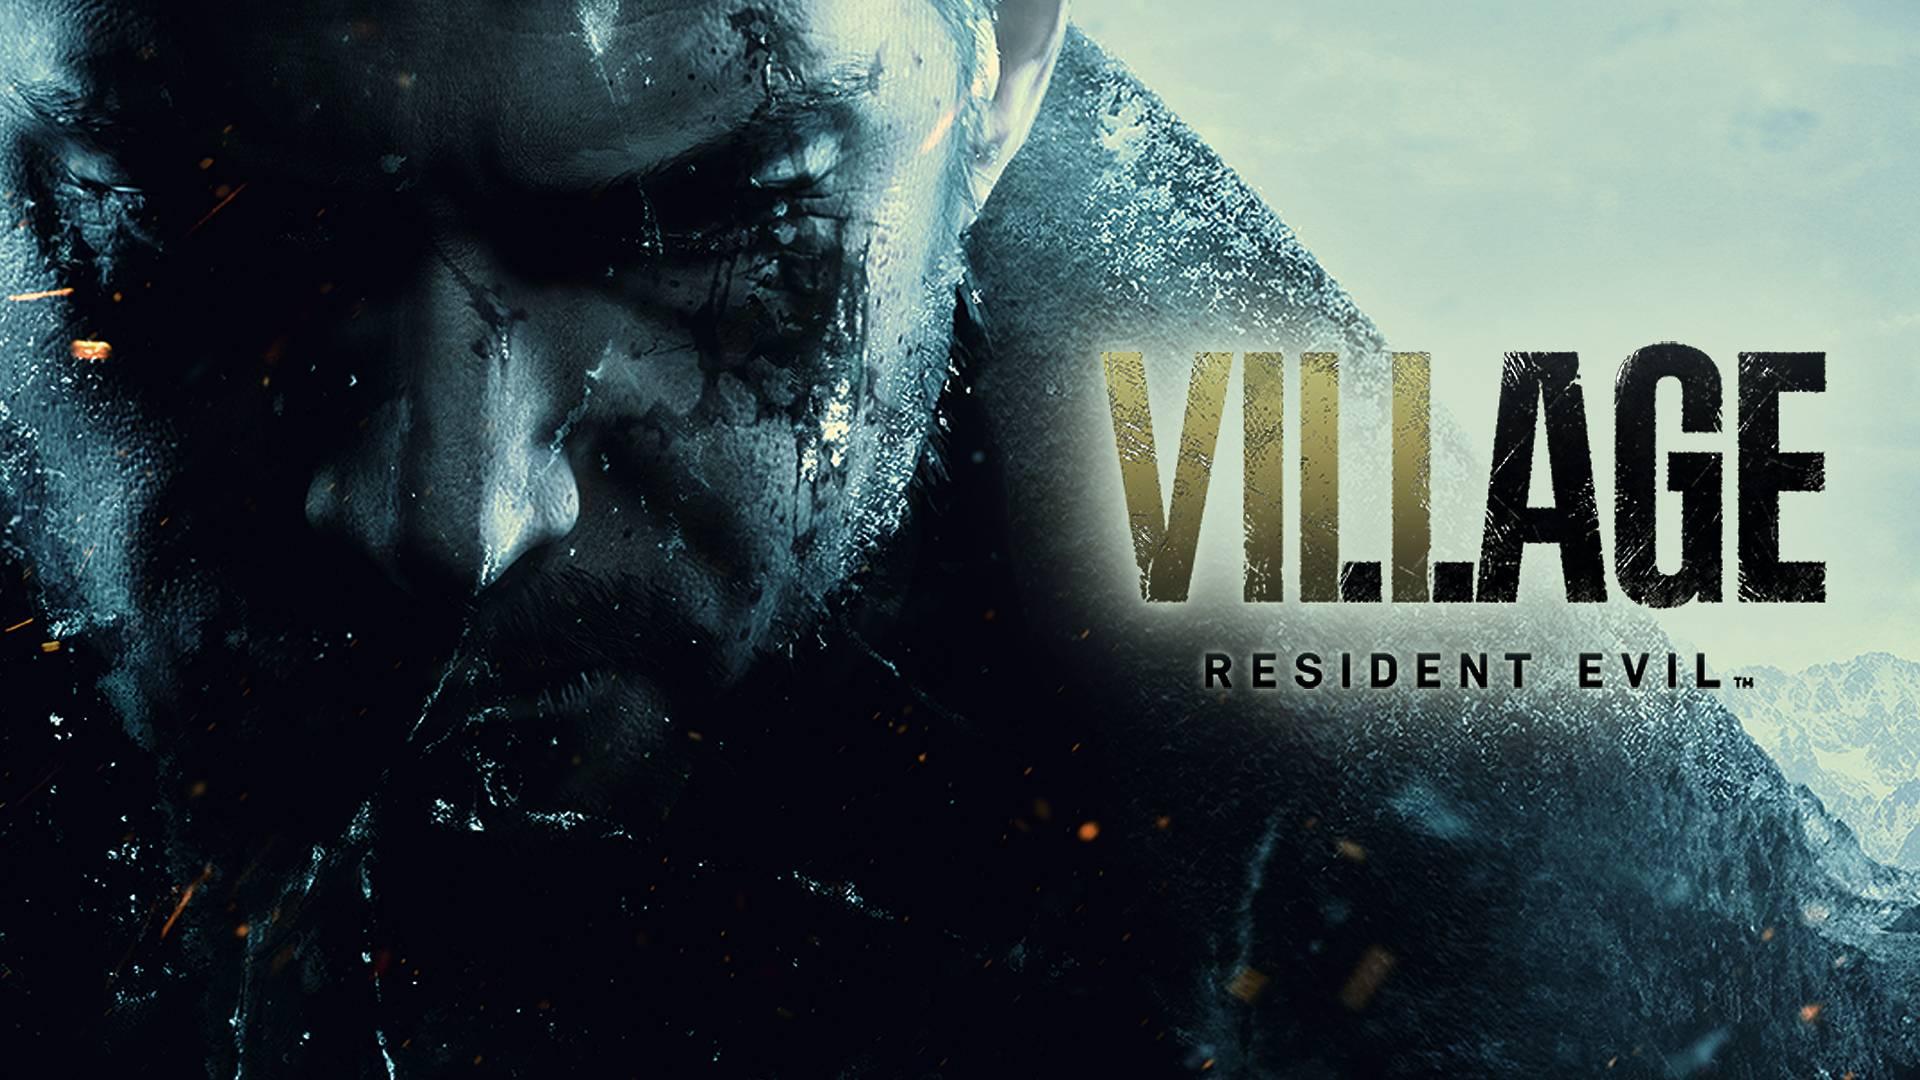 Alasan Resident Evil Village Bukan Disebut Resident Evil 8